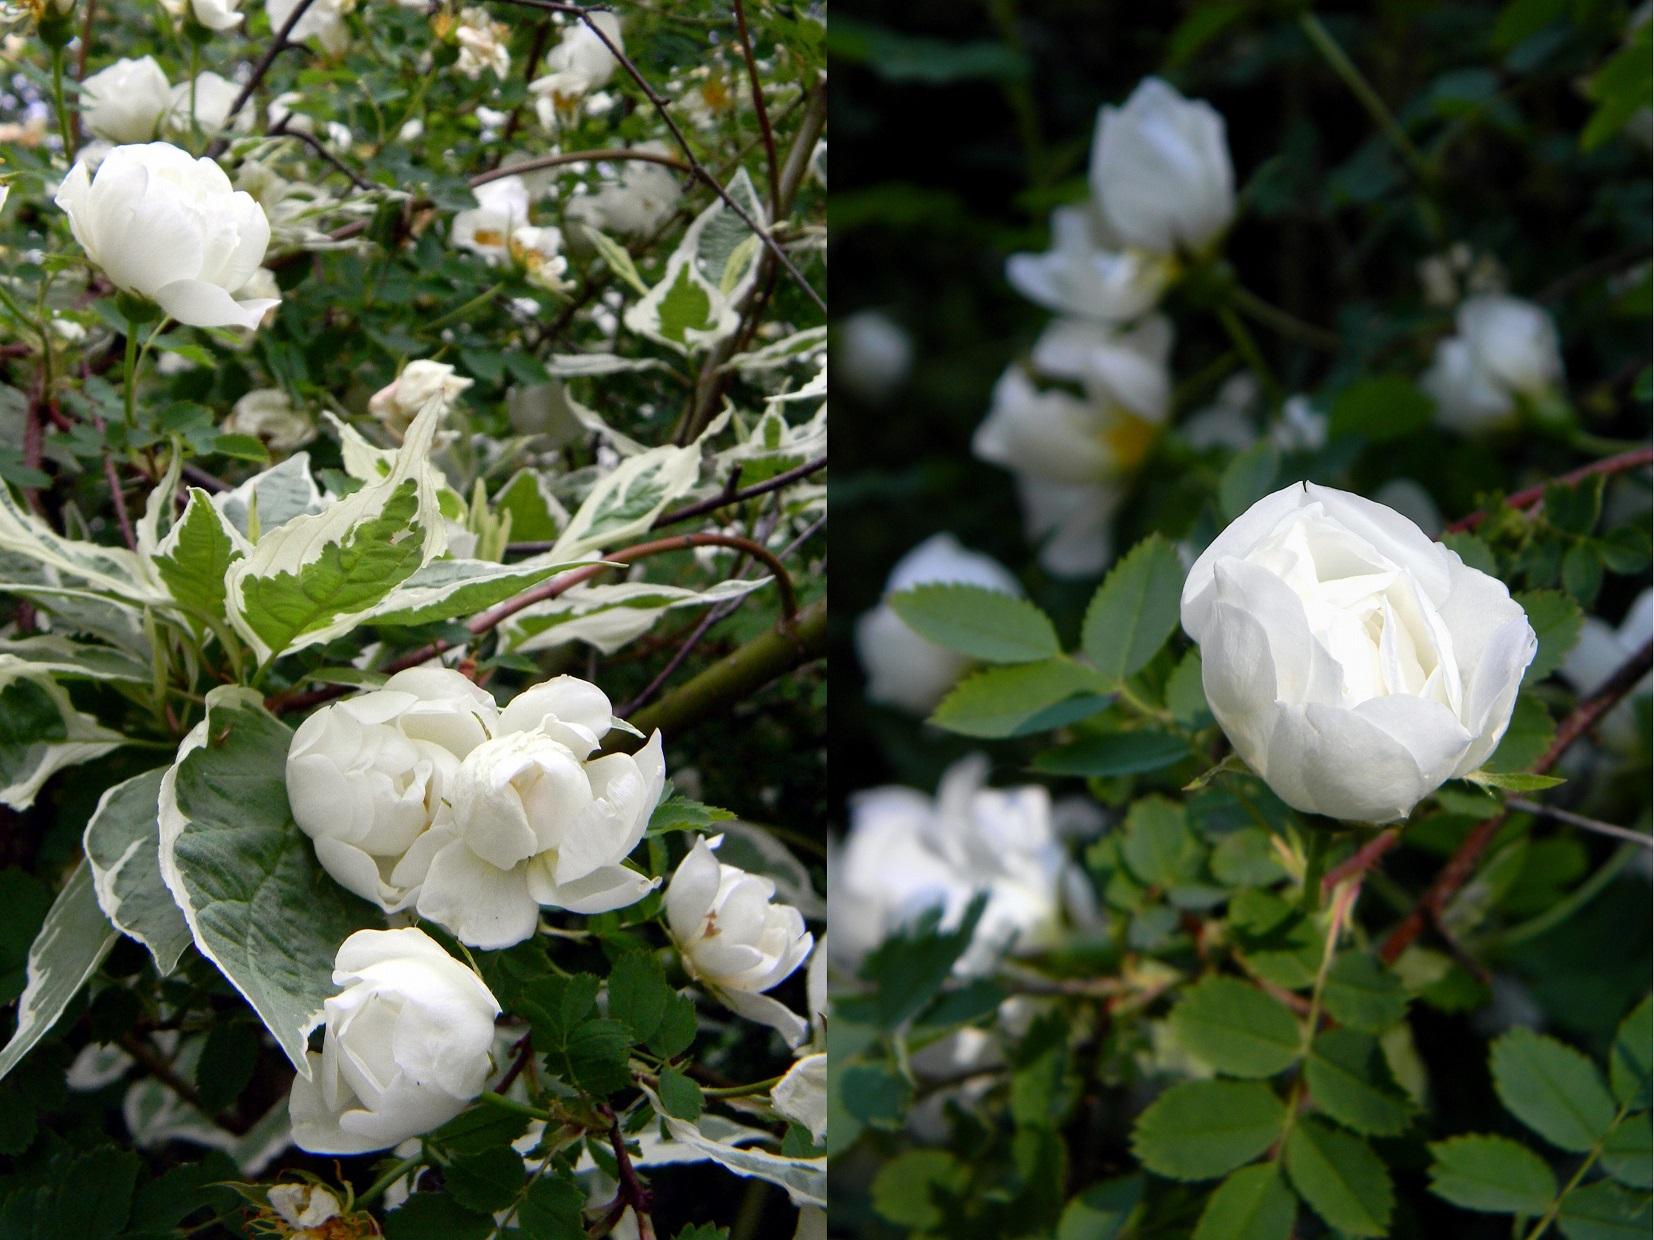 Rosa Spinosissima 'Plena', Cornus Alba 'Elegantissima'